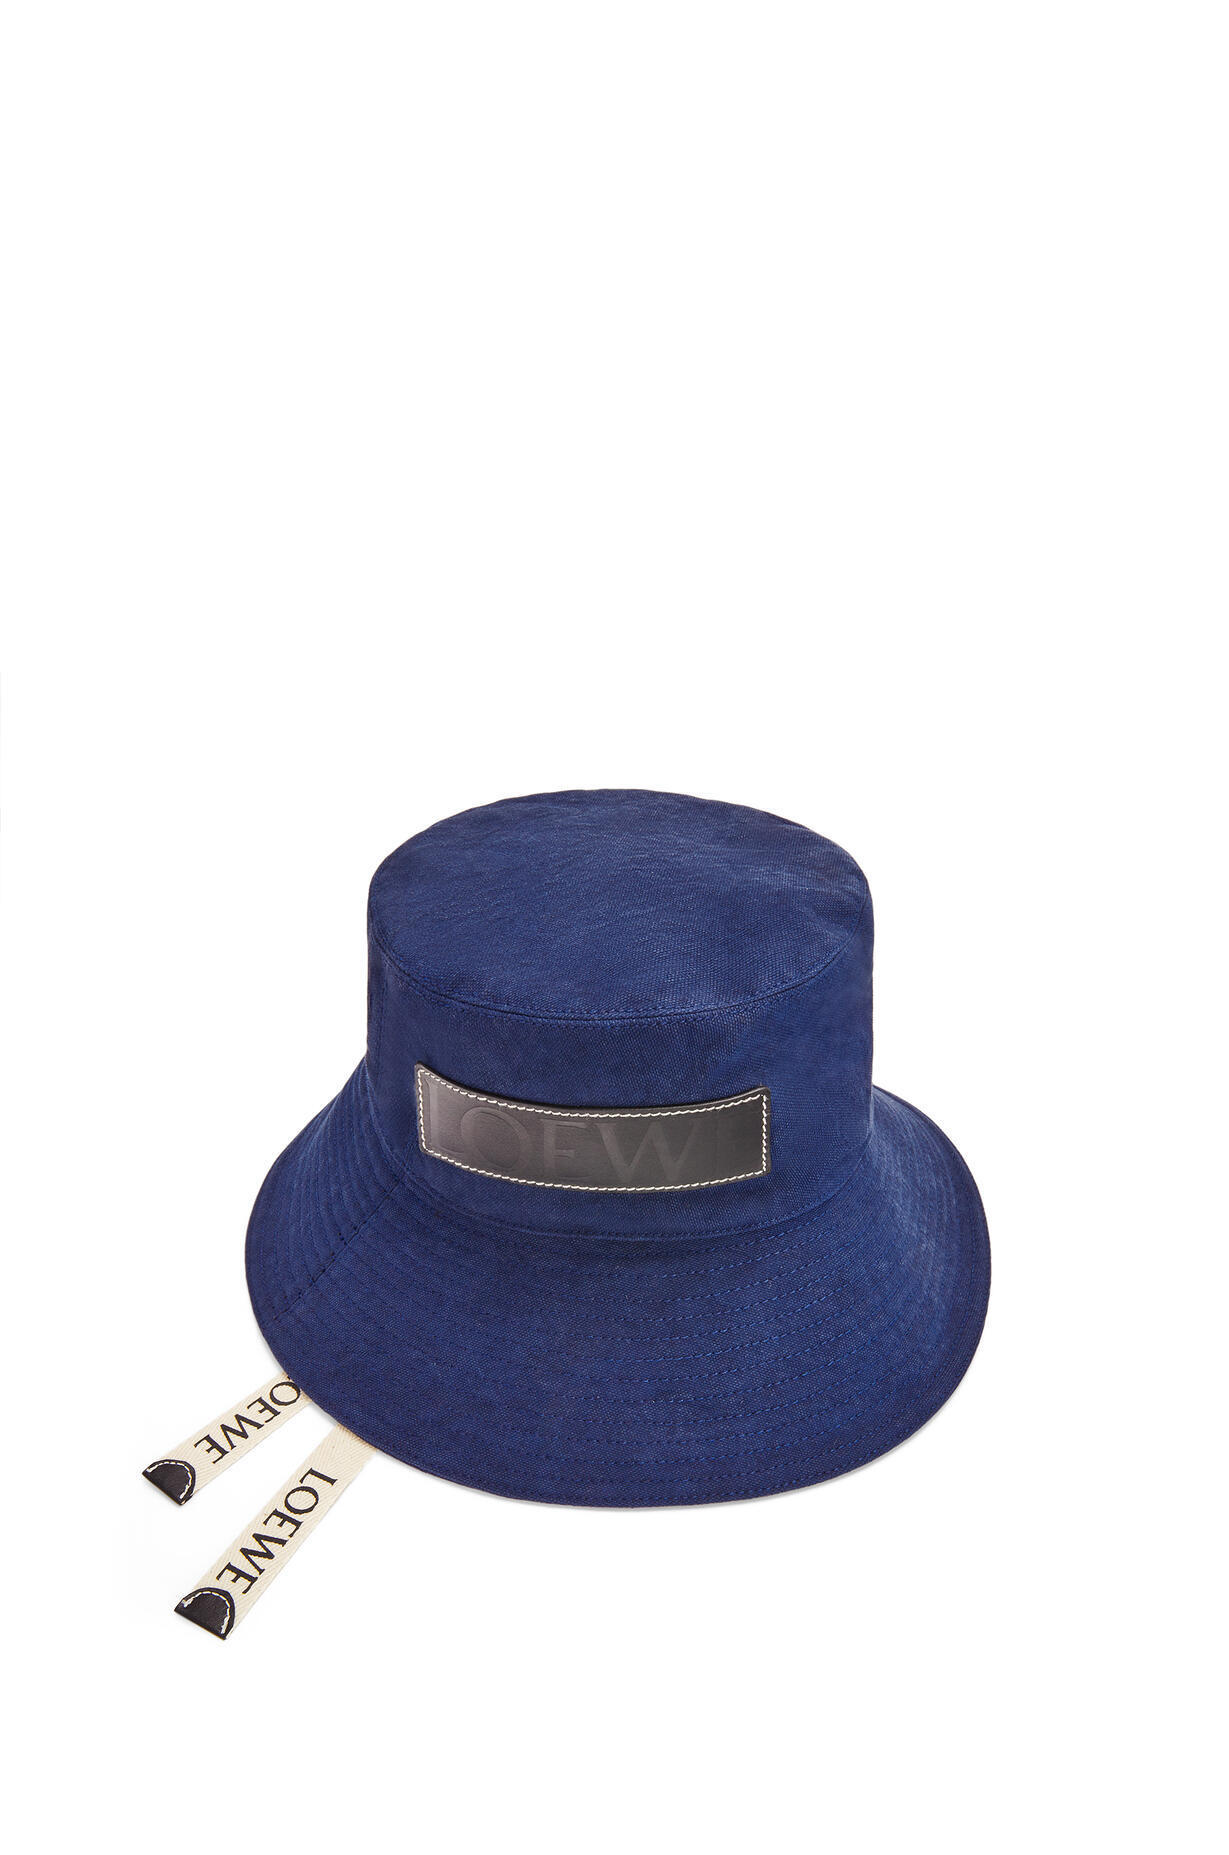 LOEWE LOEWE ☆Fisherman hat in canvas and calfskin ☆K820HF1X16